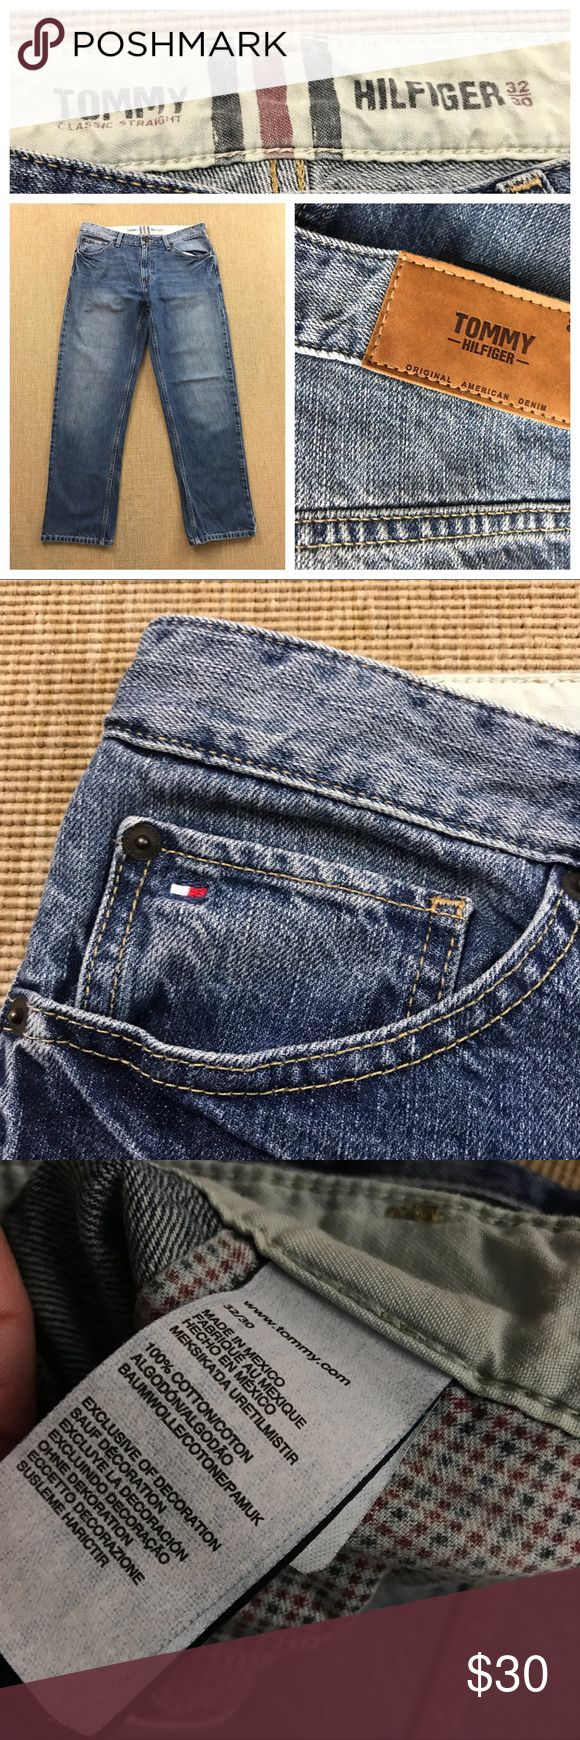 Tommy Hilfiger Jeans Size 32 X 30 Men's Straight Mens Vintage Tommy Hilfiger Jeans Size 32 X 30 Men's Straight Leg Denim. Excellent condition. Tommy Hilfiger Jeans Straight